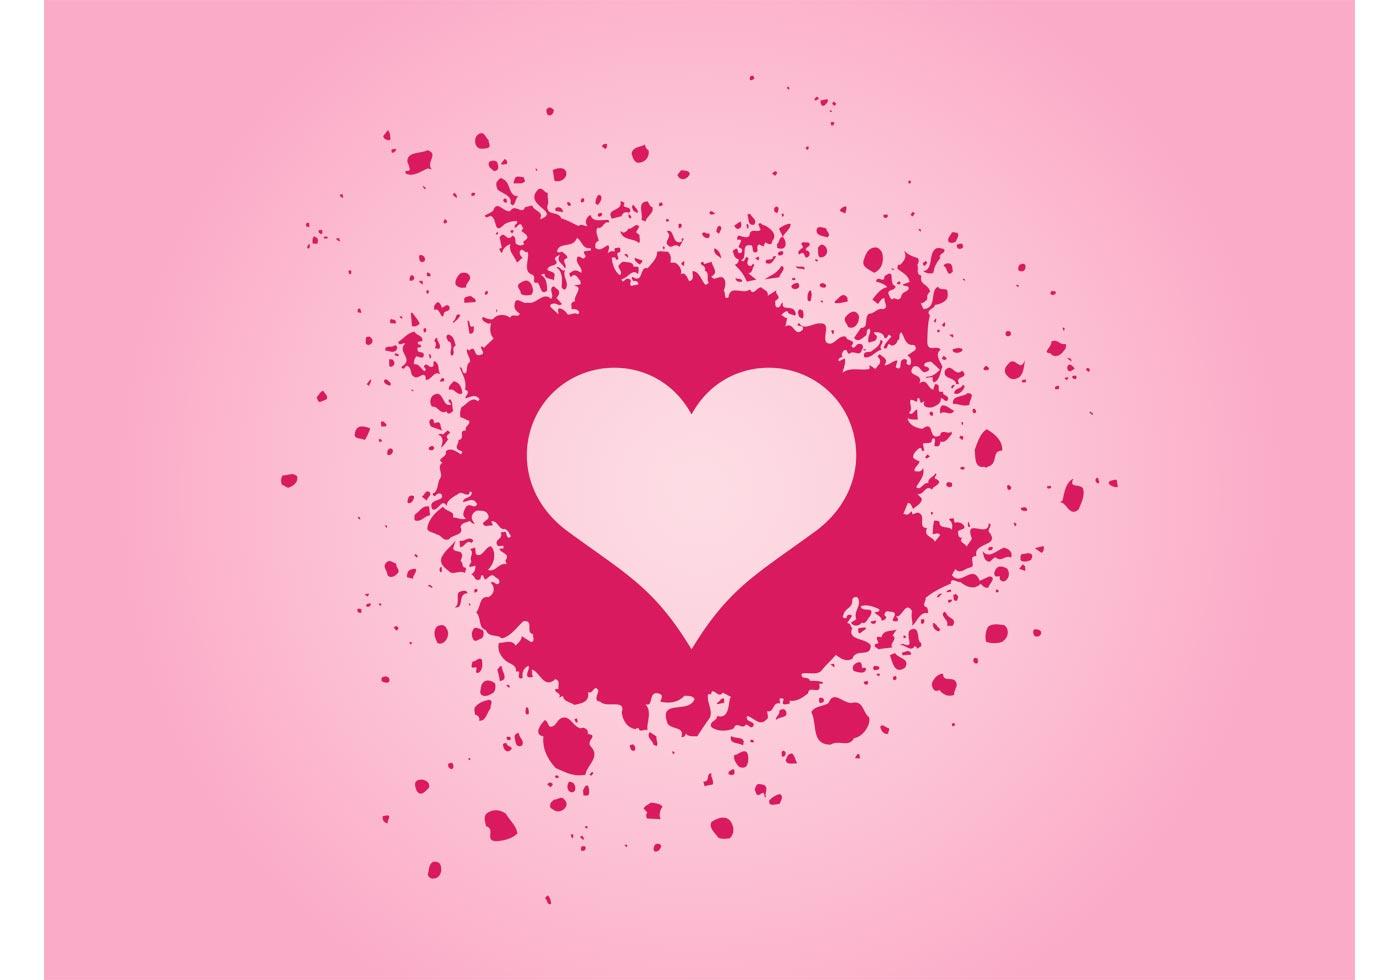 Download Pink Grunge Heart - Download Free Vector Art, Stock ...